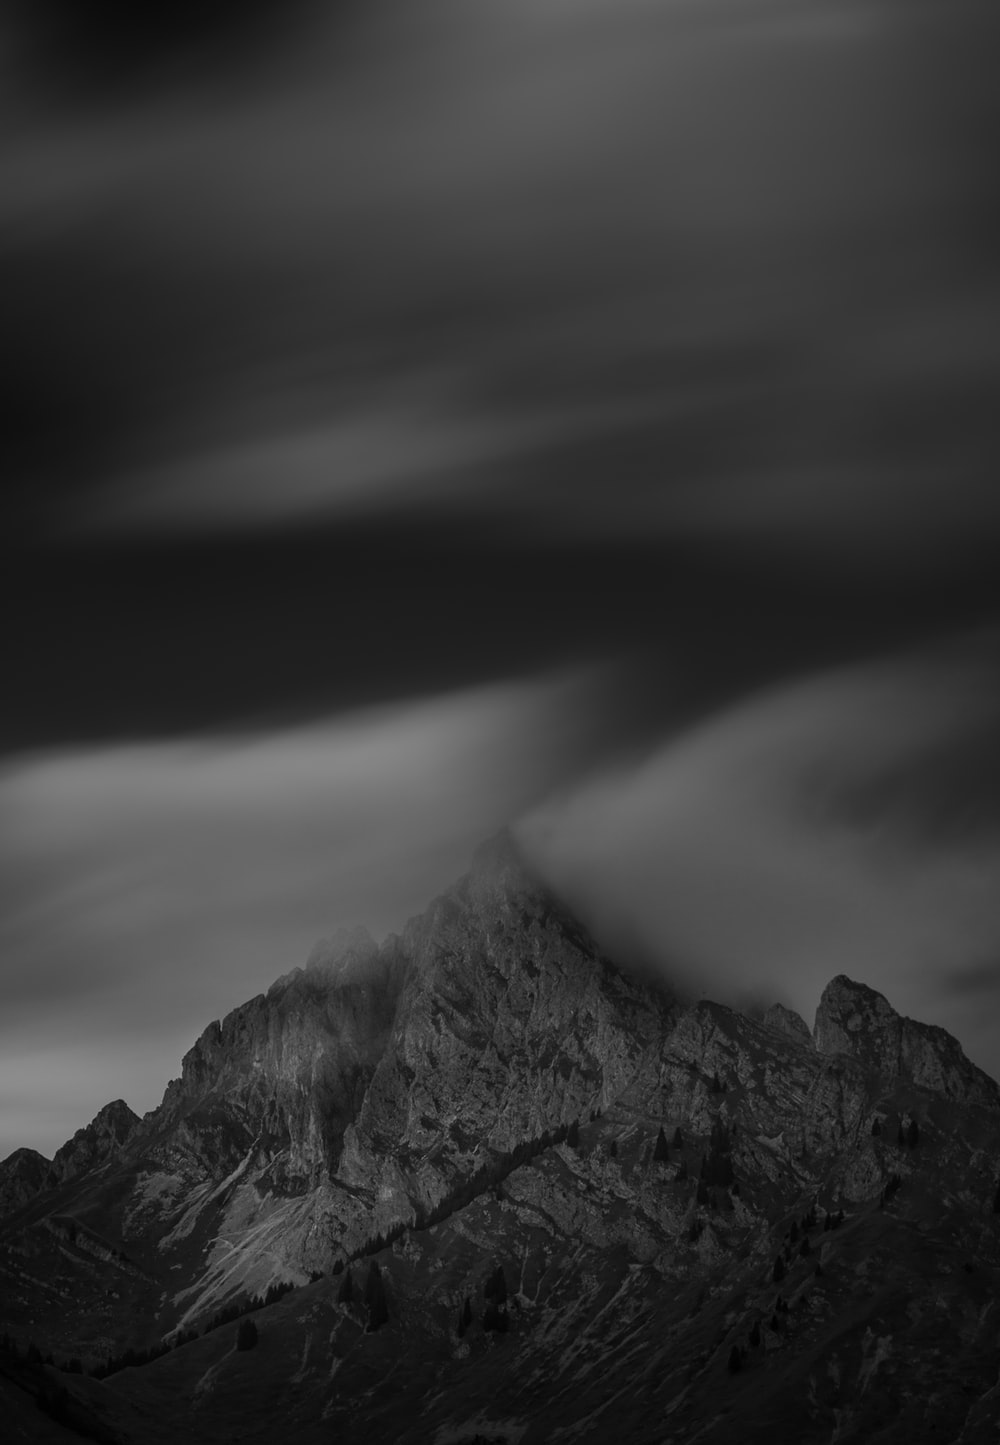 grayscale photo